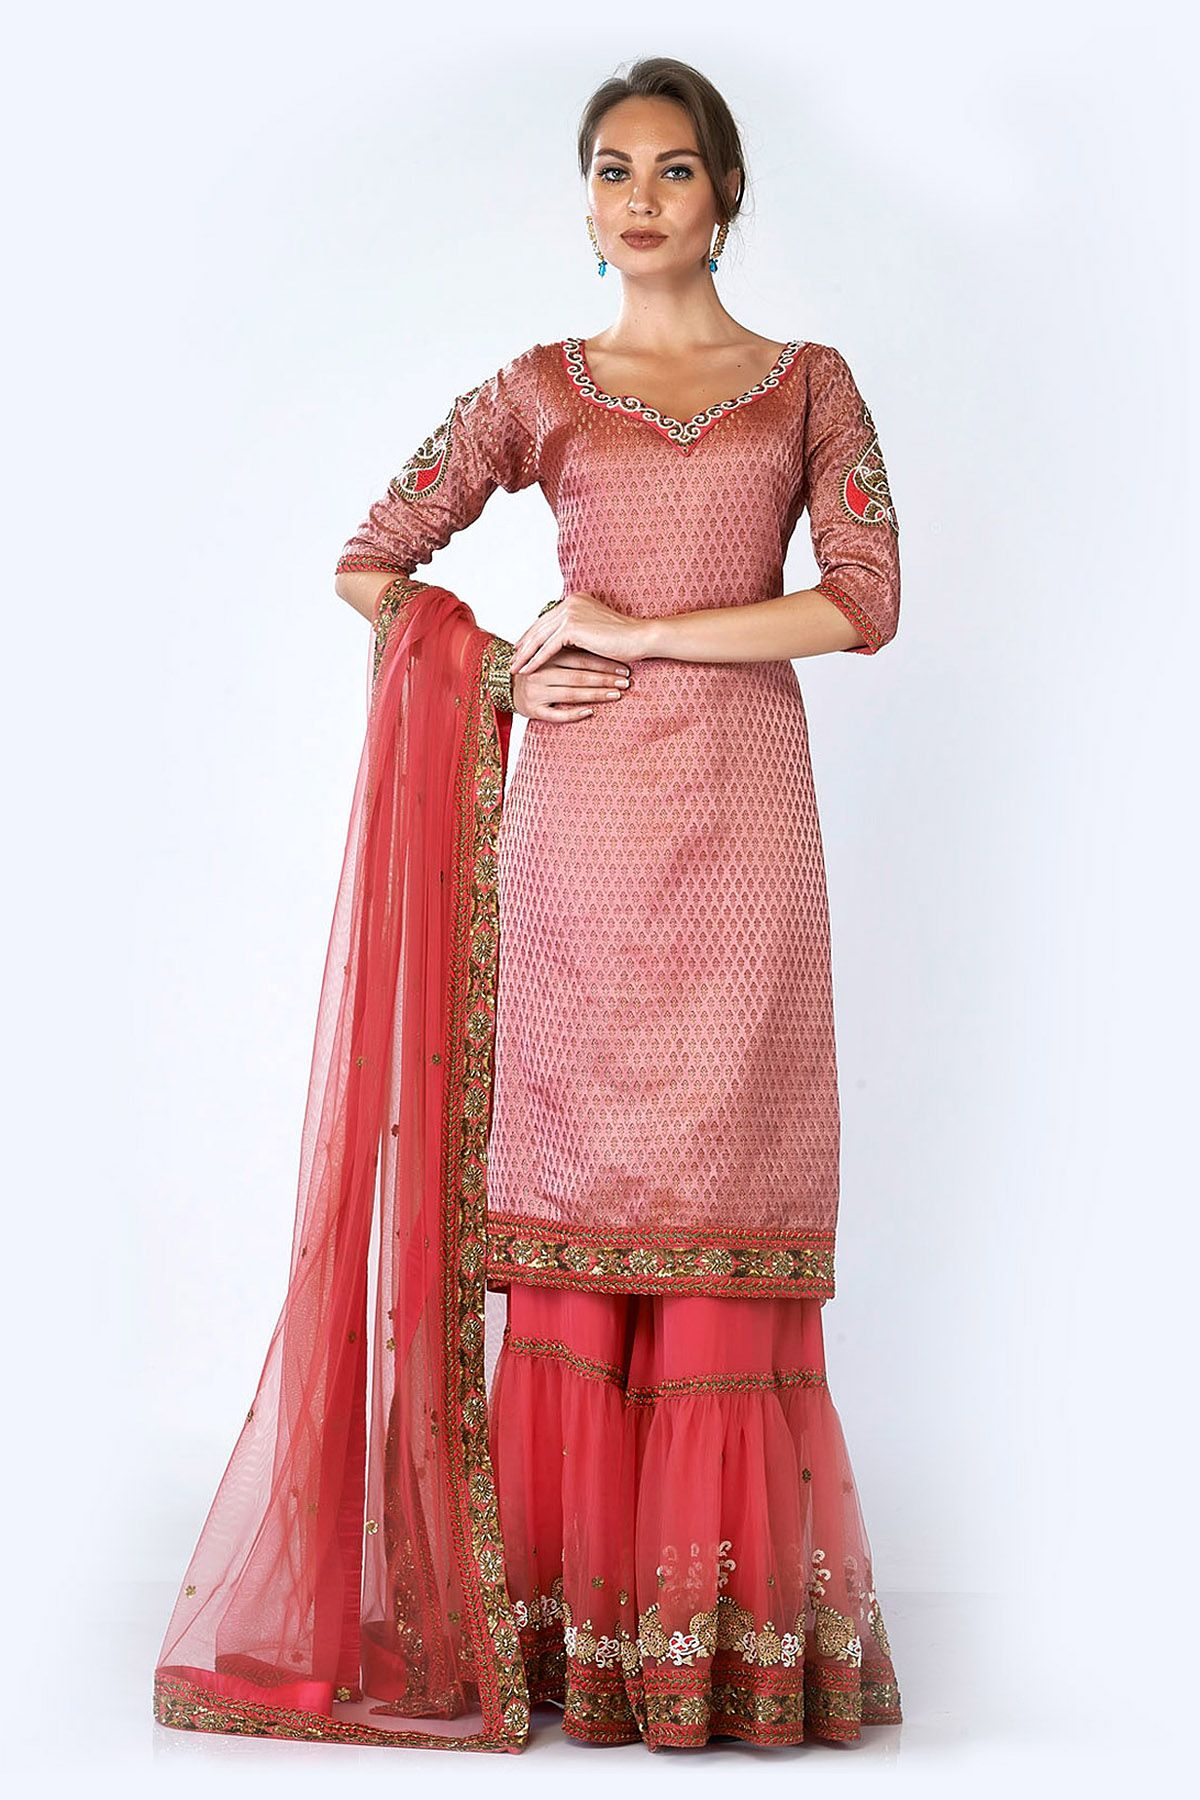 Banarsi Brocade Gharara, Indian Suits, Designer, Latest, Online ...